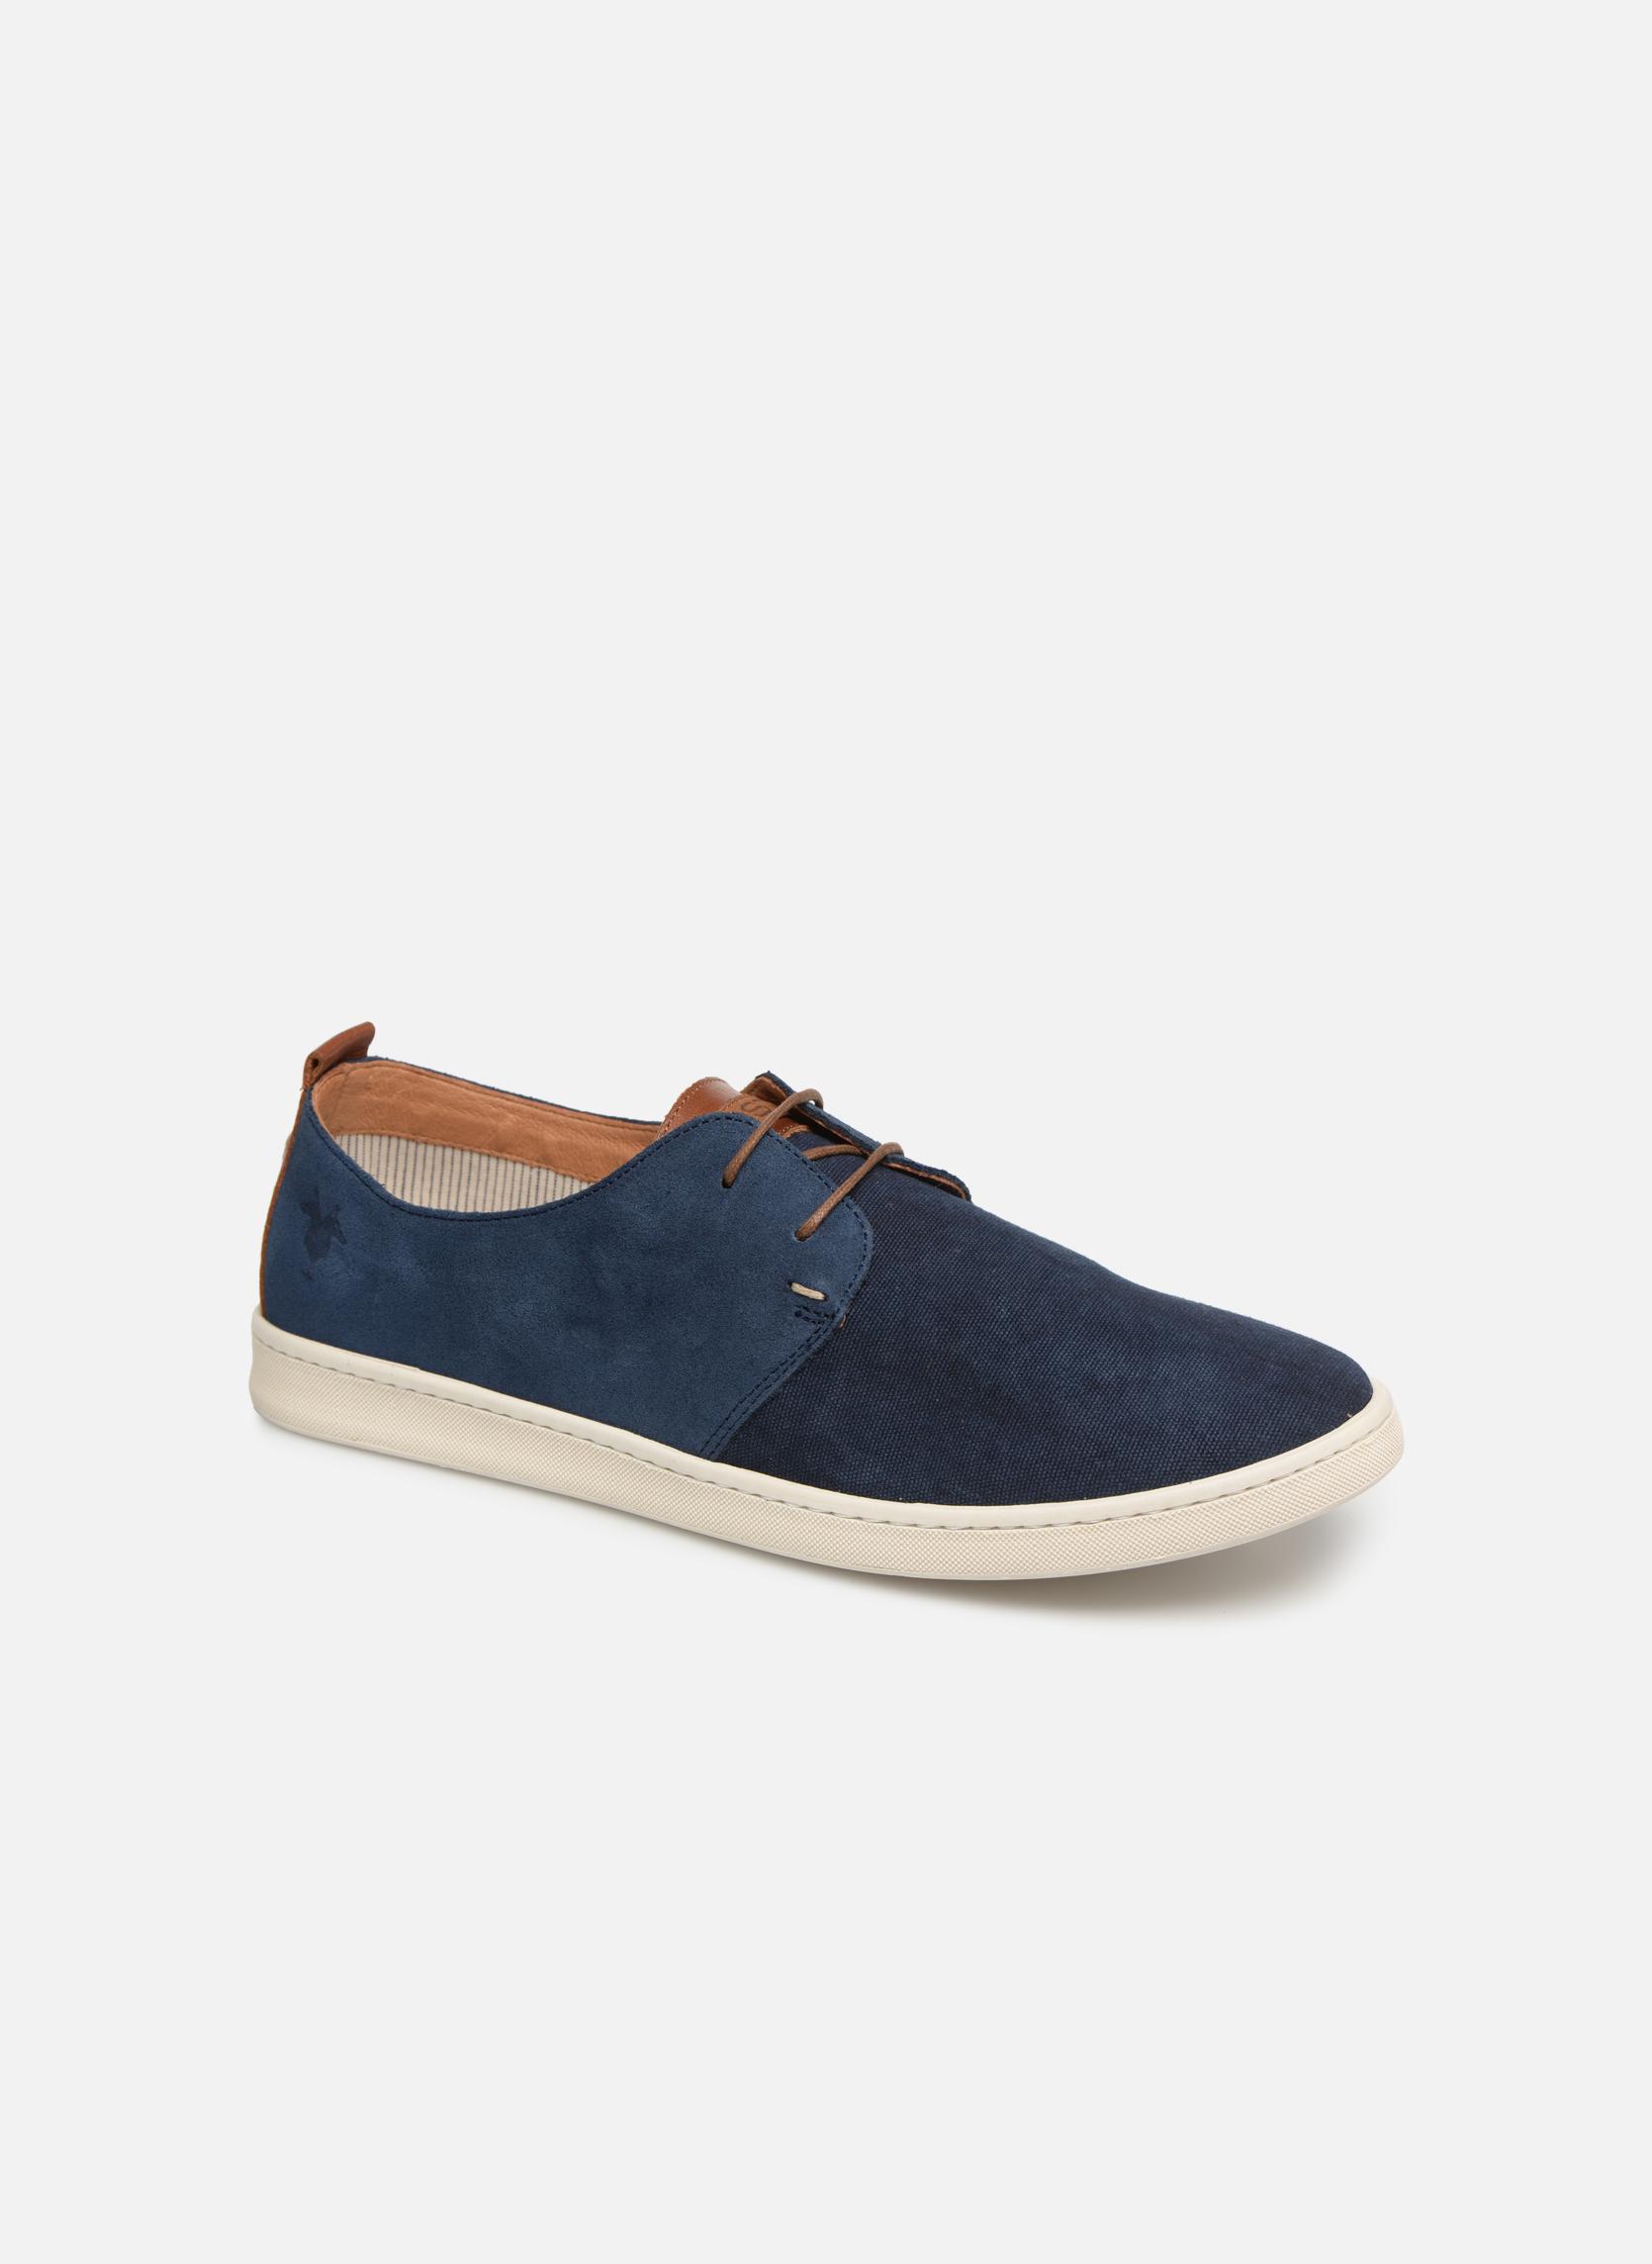 Sneakers Joueur 55A by Kost